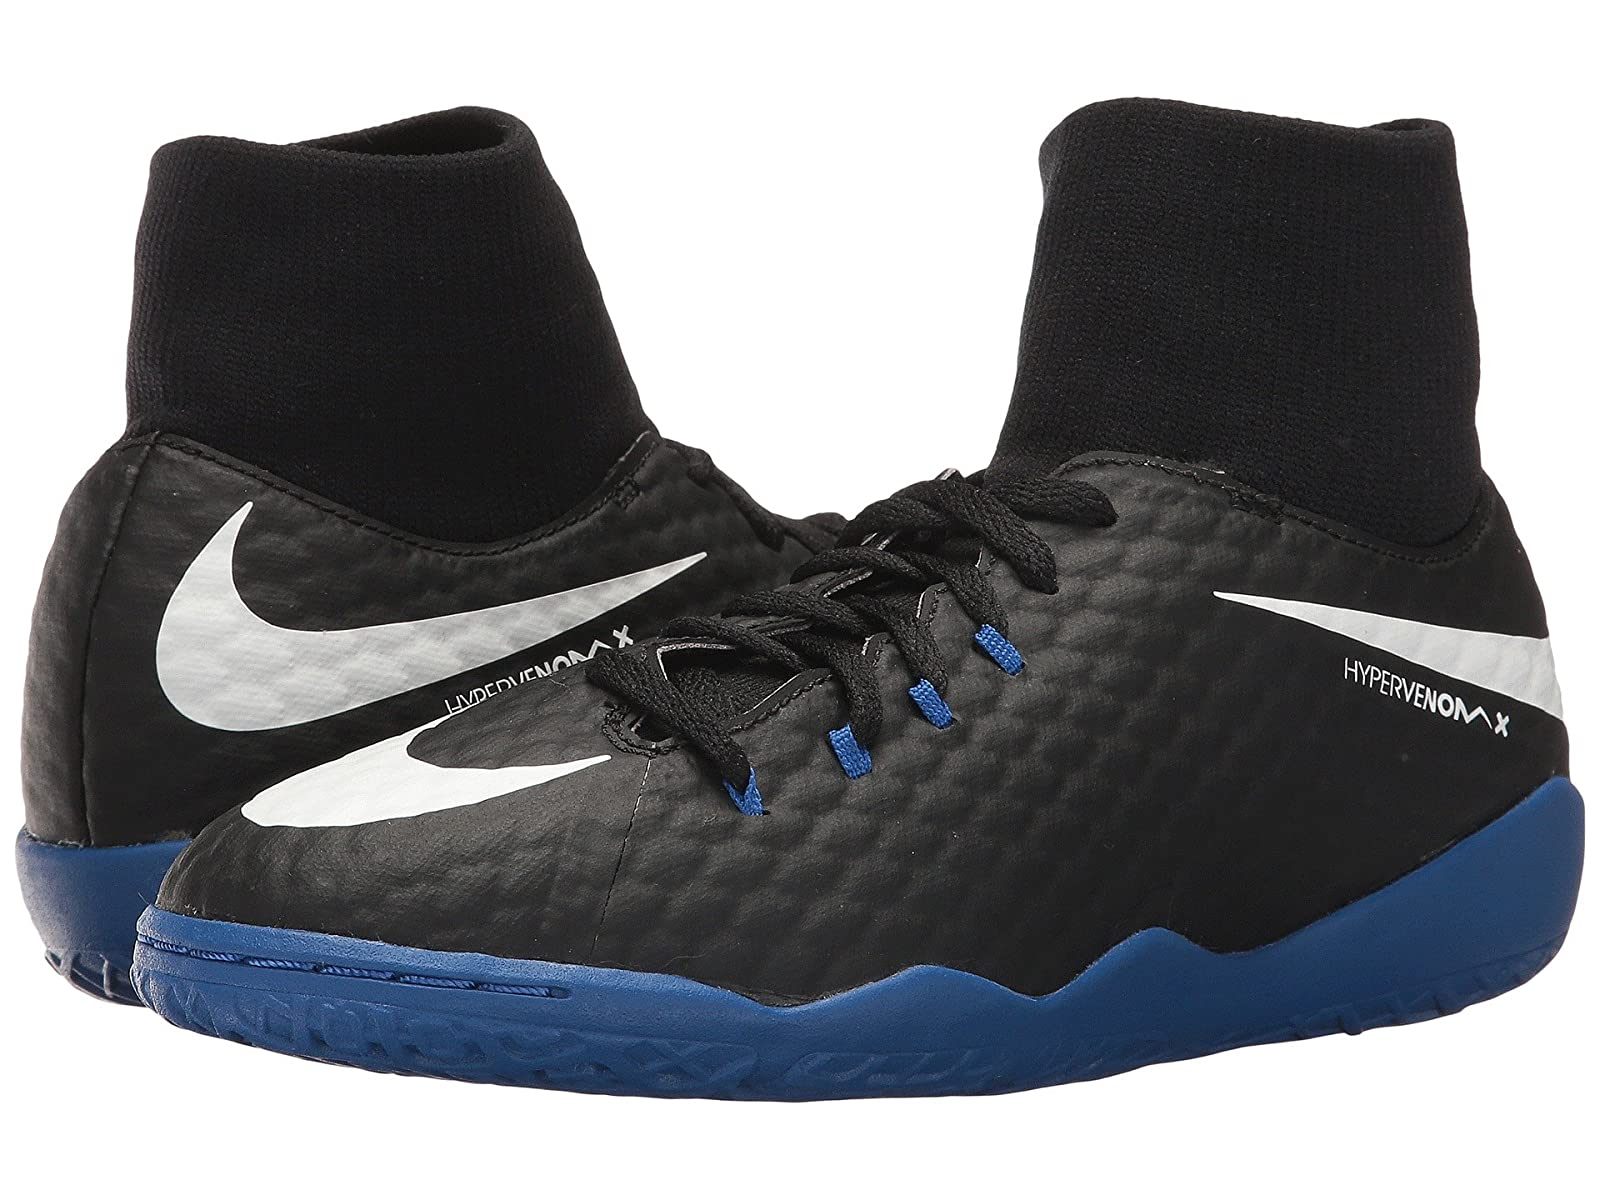 Nike Kids HypervenomX Phelon III Dynamic Fit IC Soccer Shoe (Little Kid/Big Kid)Cheap and distinctive eye-catching shoes